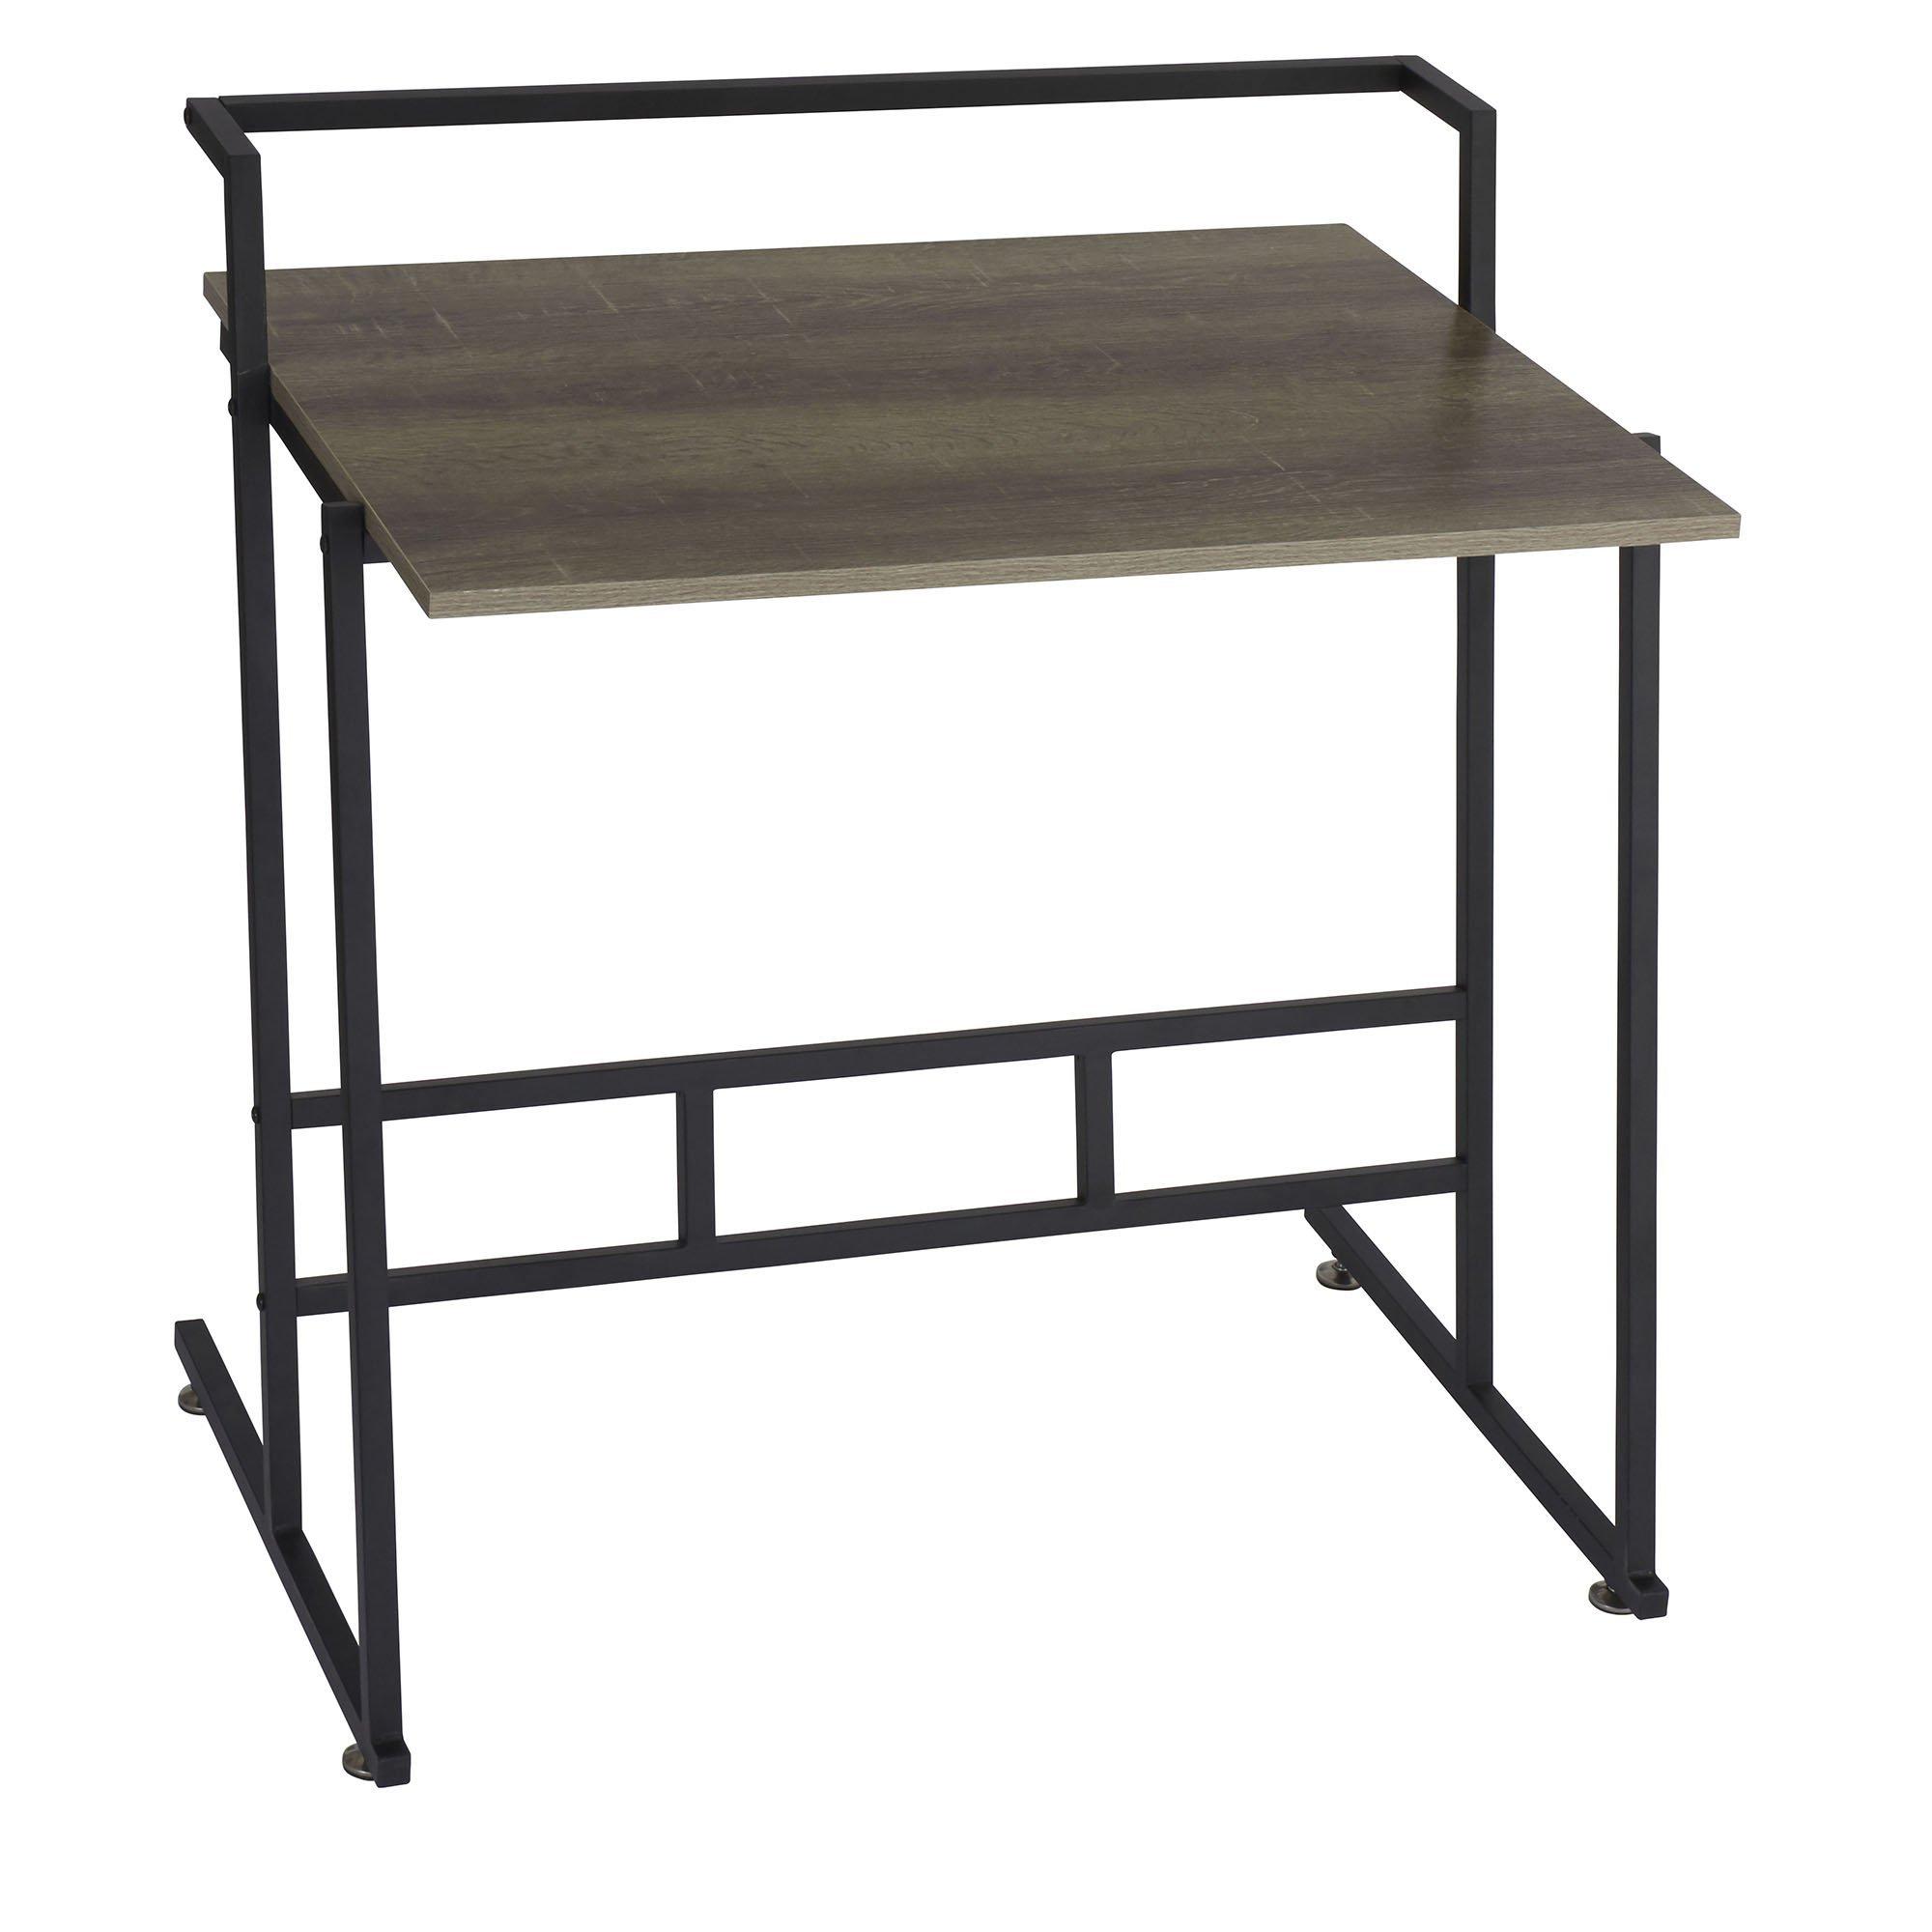 Household Essentials 8070-1 Ashwood Office Desk | Gray-Brown | Black Metal Frame